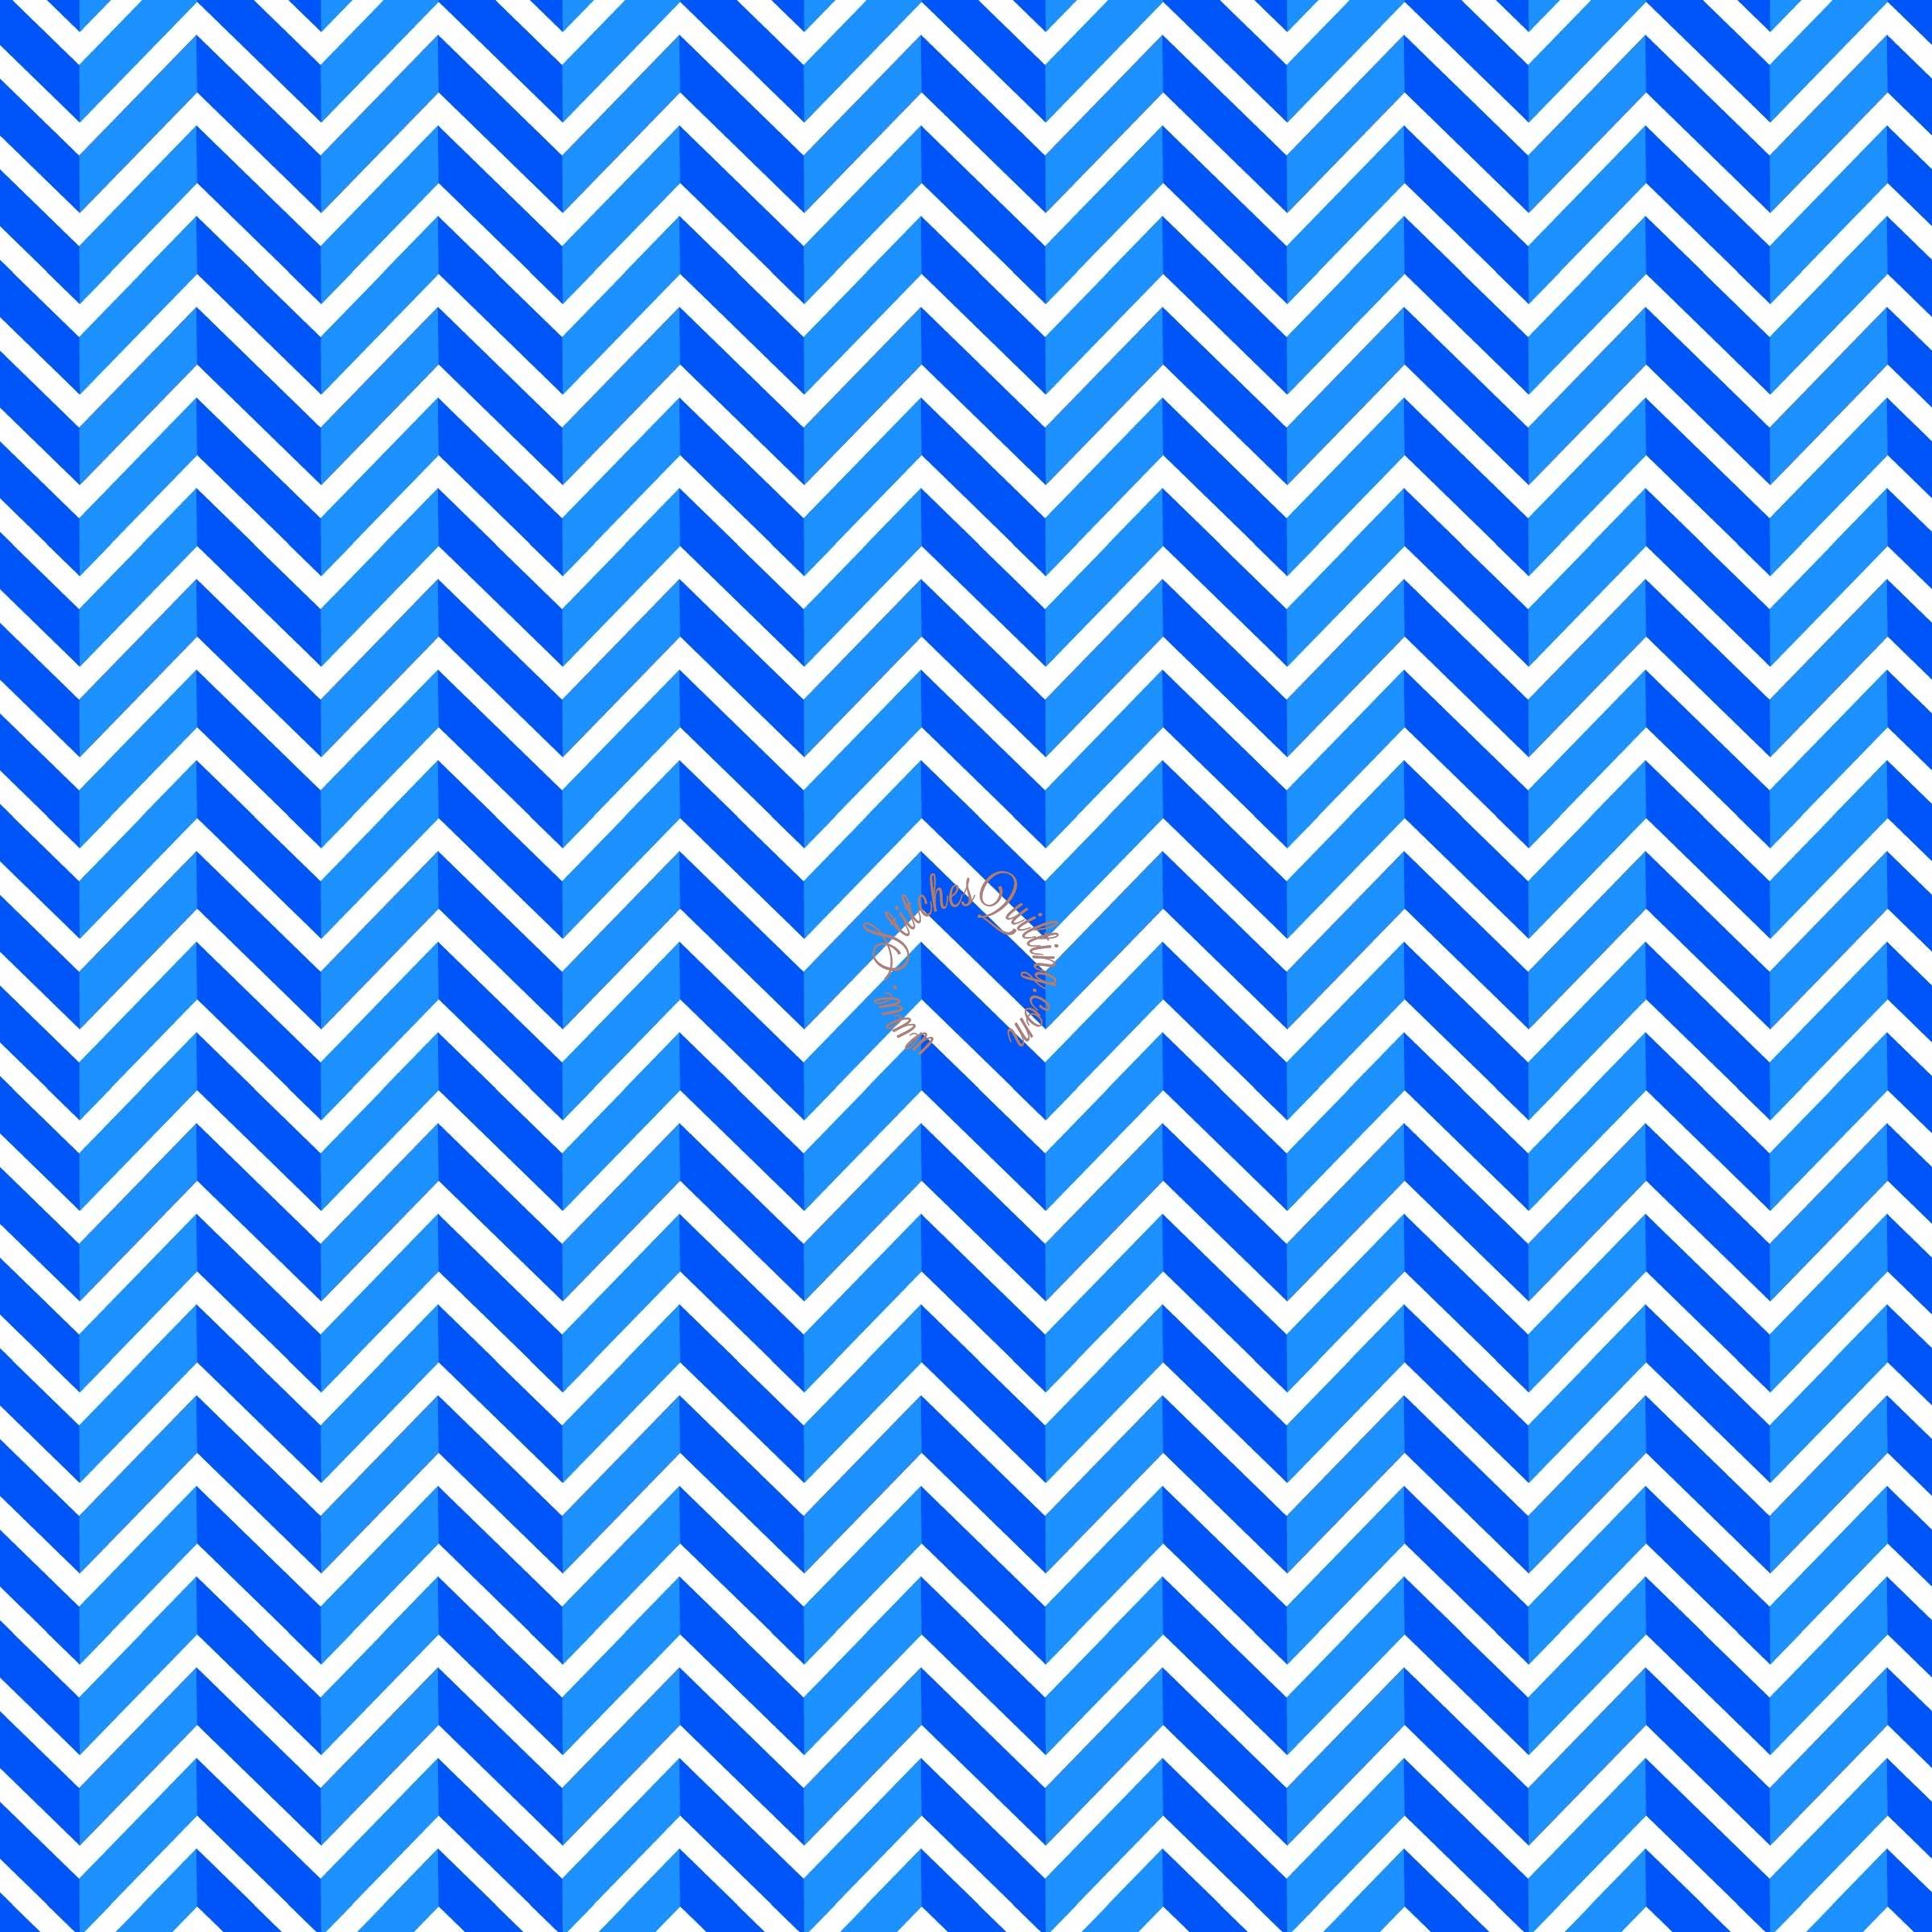 Blue Stripes Chevron Fabric Star Spangled Doodlebug Riley